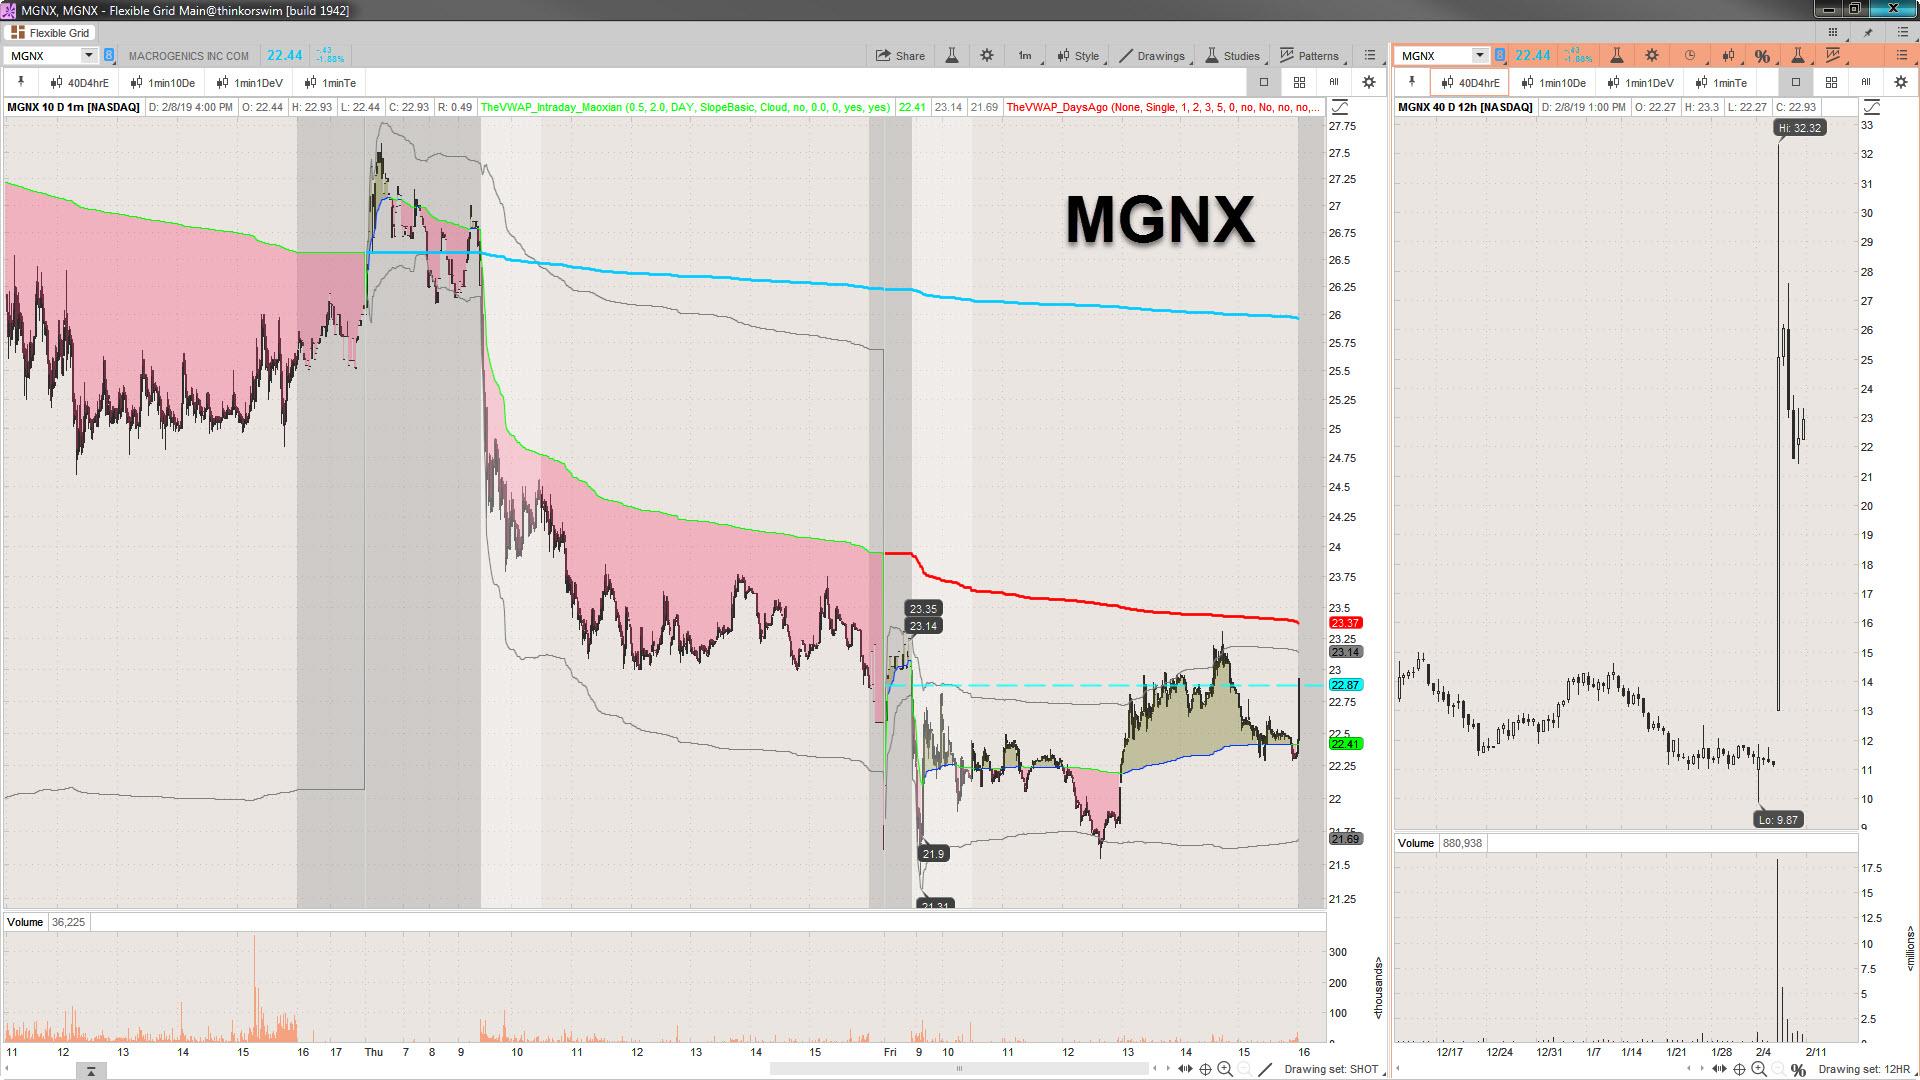 2019-02-08_16-09-23 MGNX.jpg